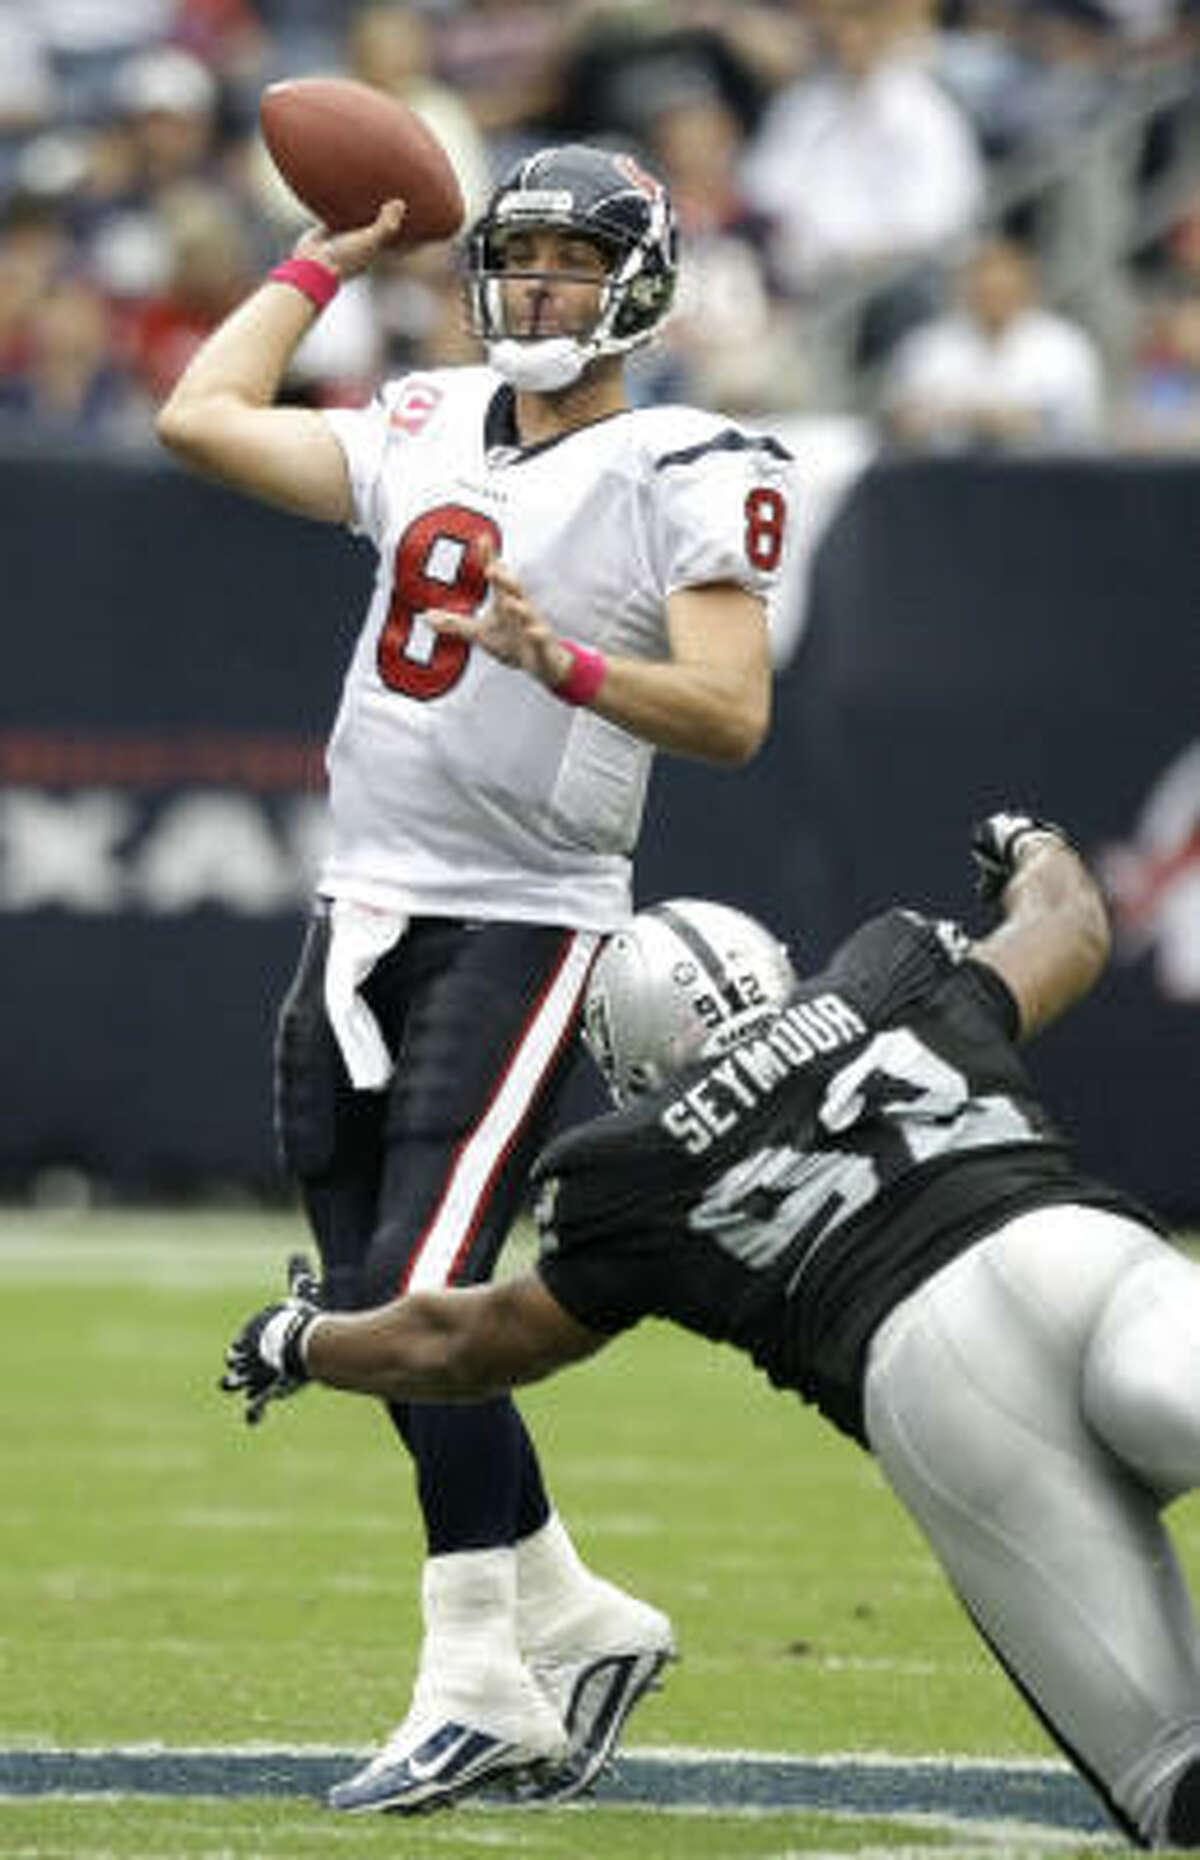 Matt Schaub has impressed Texans coach Gary Kubiak with the way he's throwing the ball and handling the team.